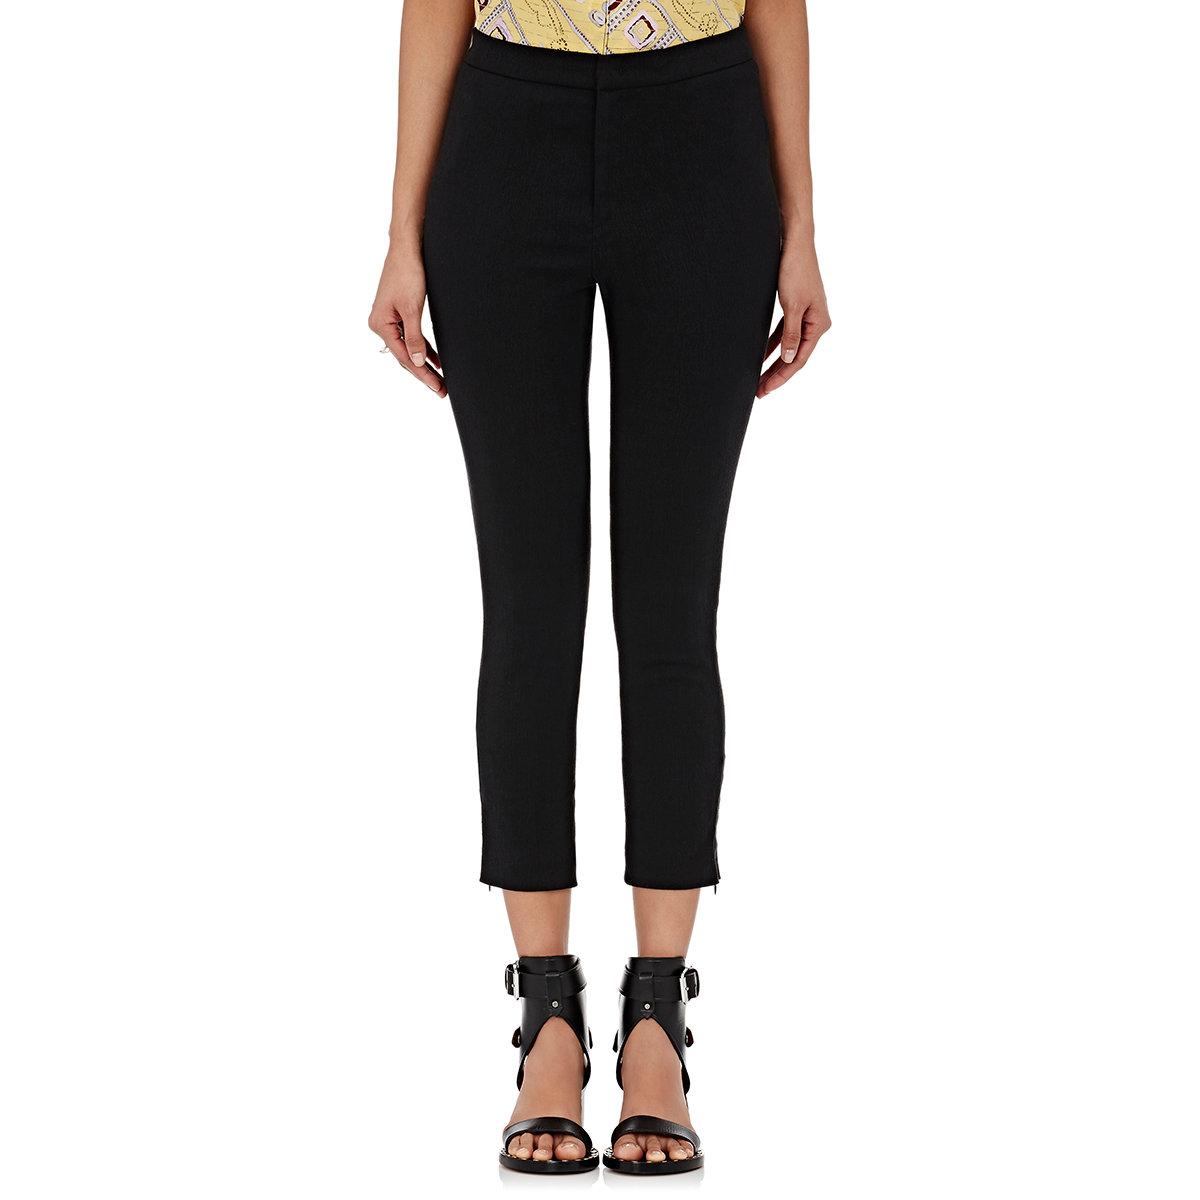 329914ab28 Isabel Marant Women's Lindy Skinny Pants in Black - Lyst